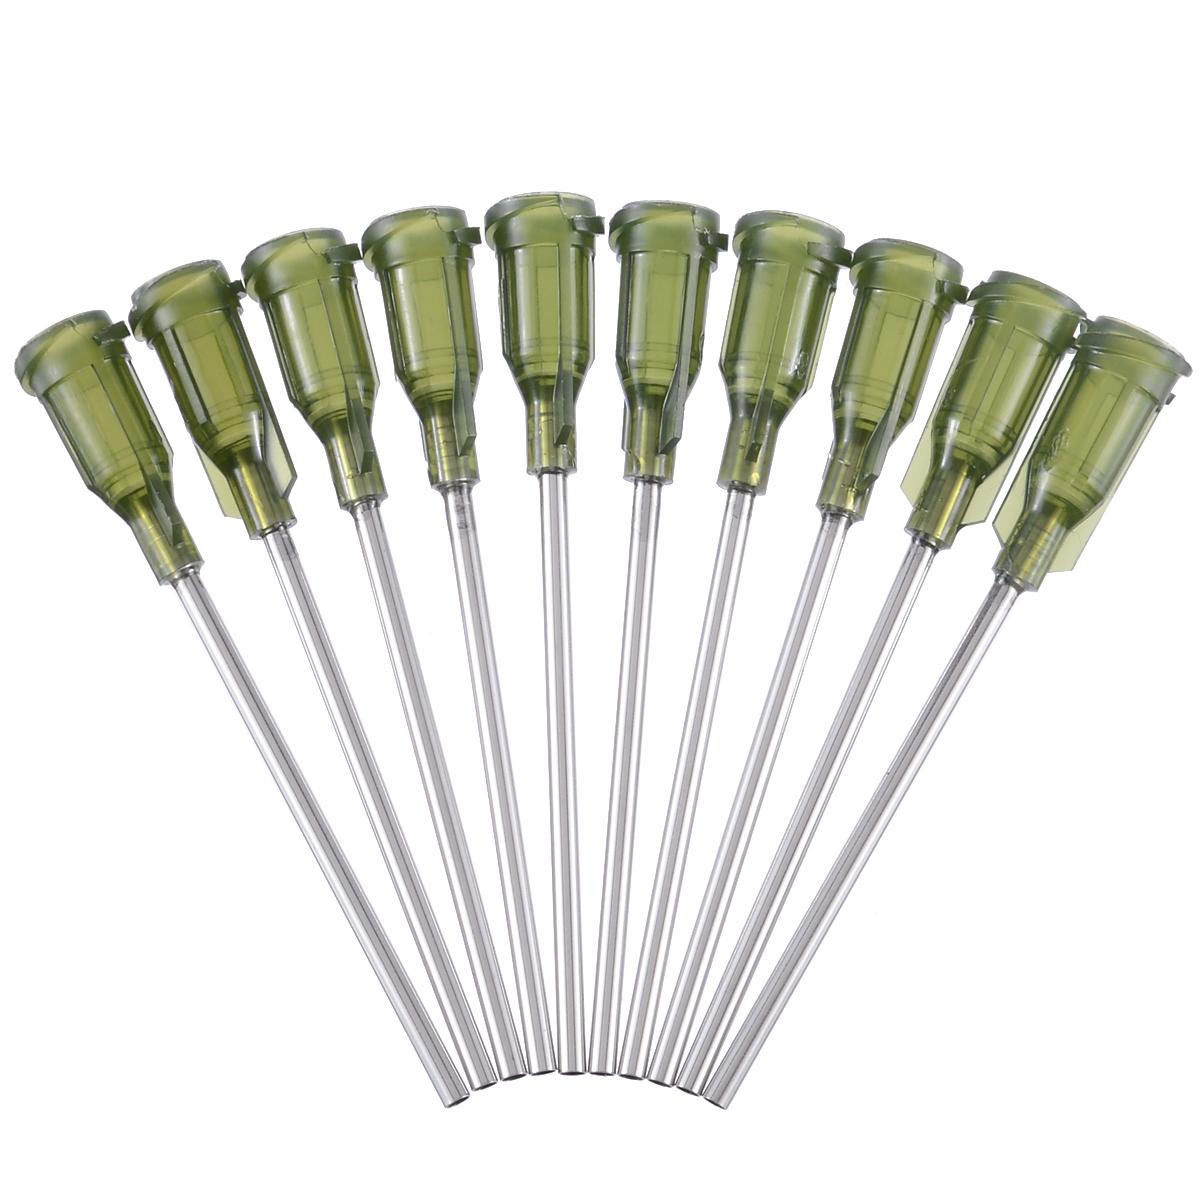 10pcs Syringe Needle Blunt Tip Dispensing Stainless Steel Needles with Luer Lock 14 Ga 1.5inch for Liquid Dispenser Syringe